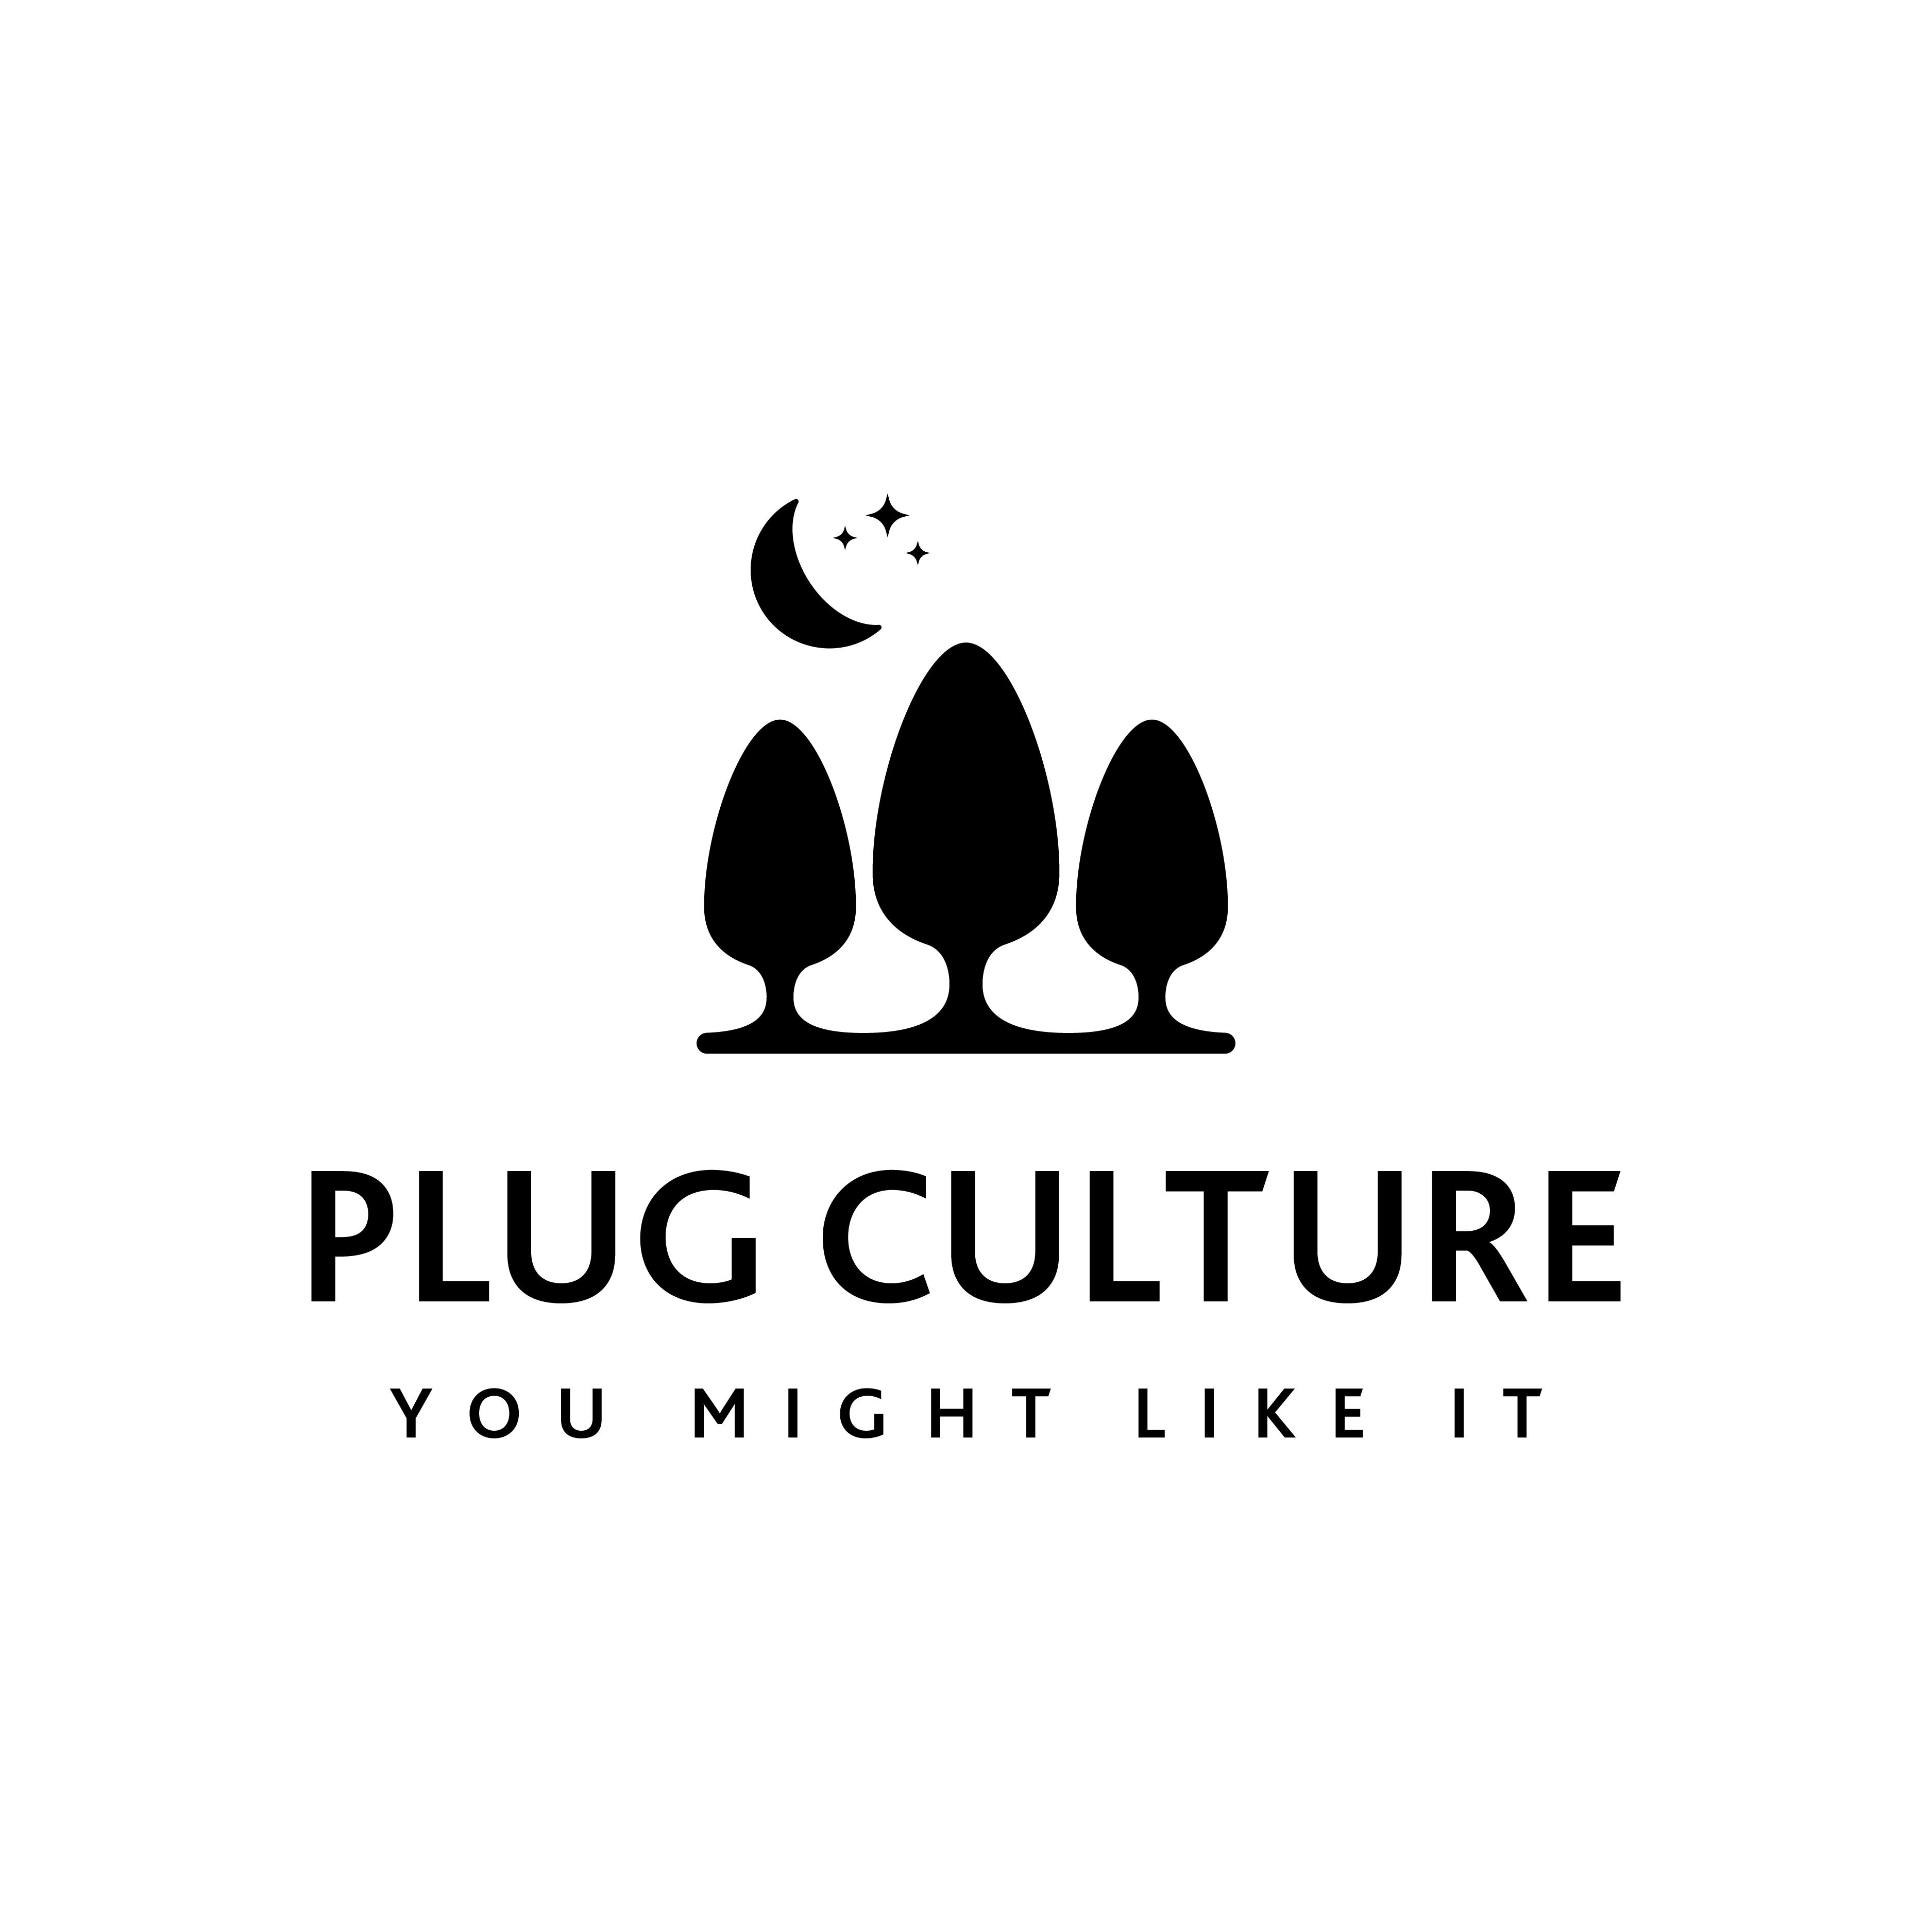 Plug Culture logo design by logo designer Radu Moraru